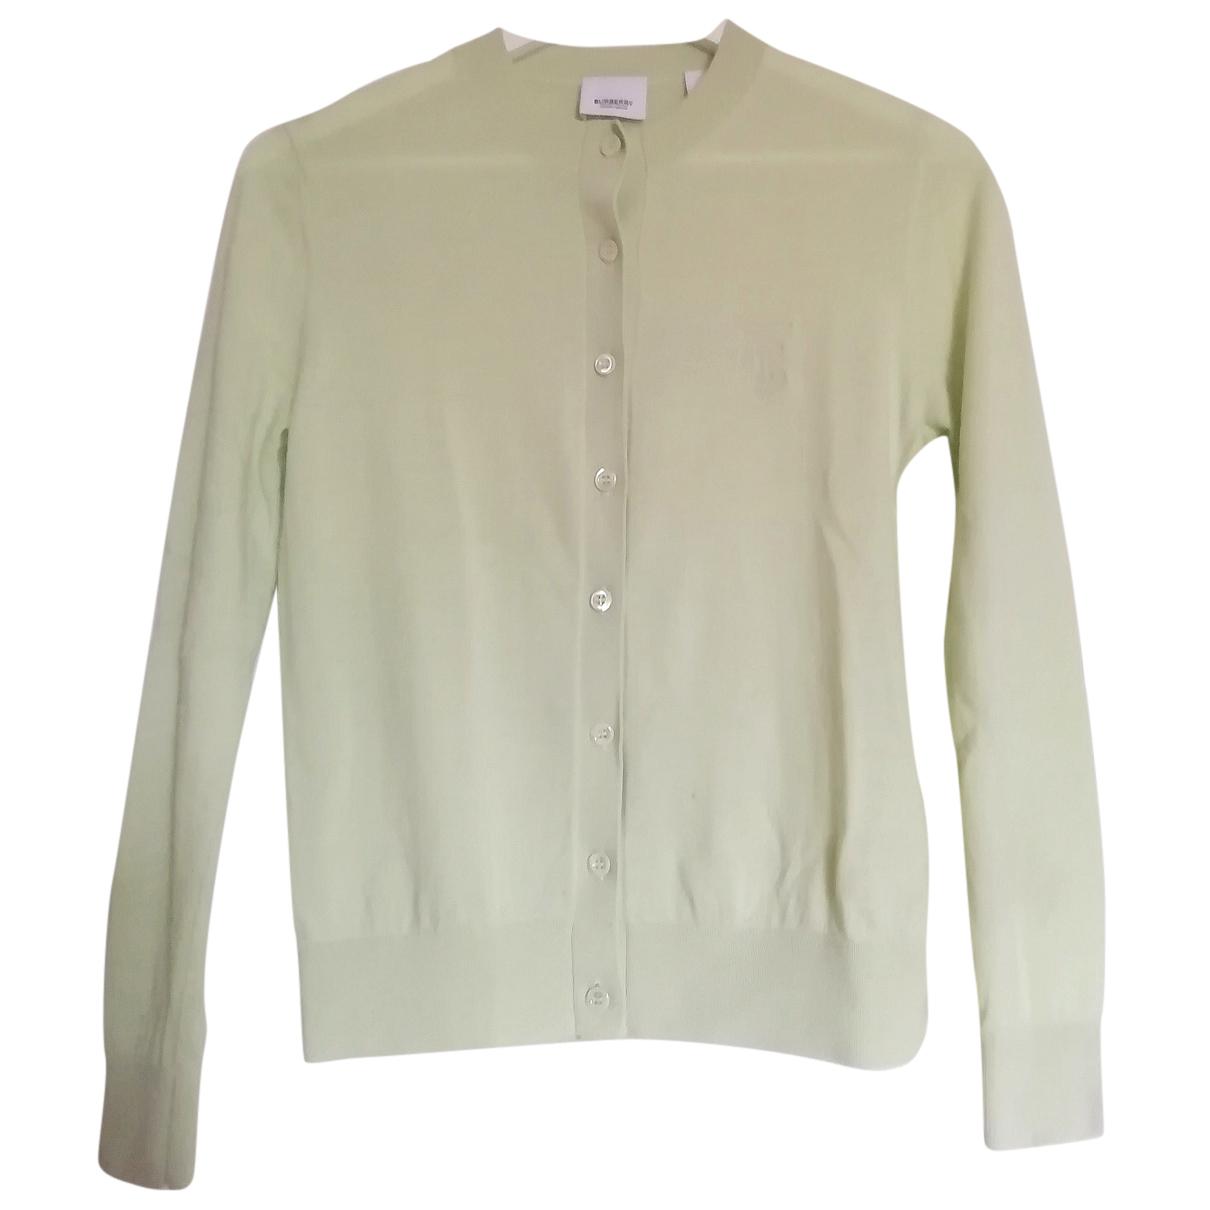 Burberry N Green Cashmere Knitwear for Women S International